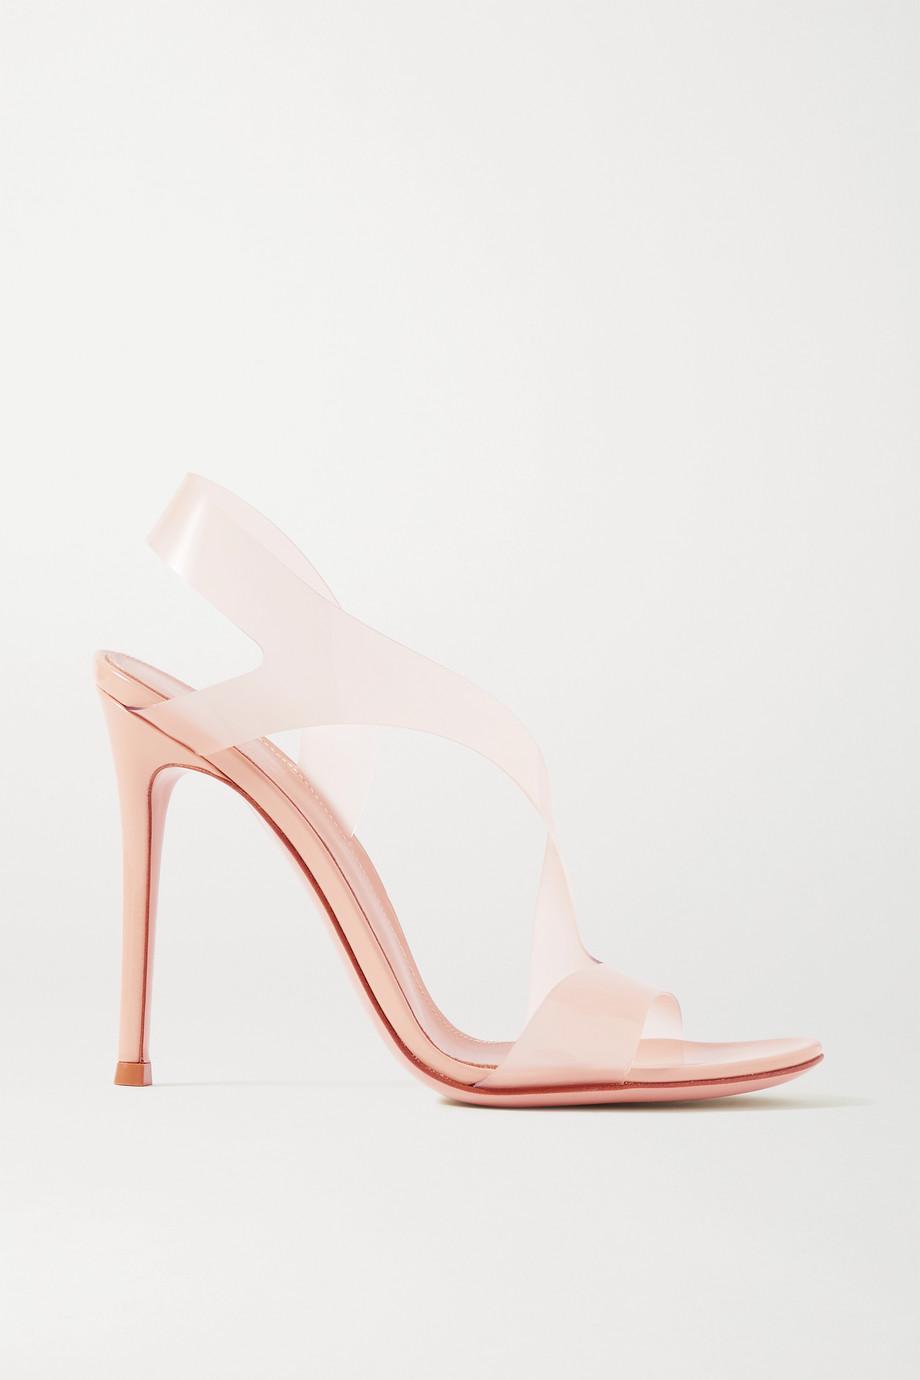 Gianvito Rossi 105 PVC slingback sandals